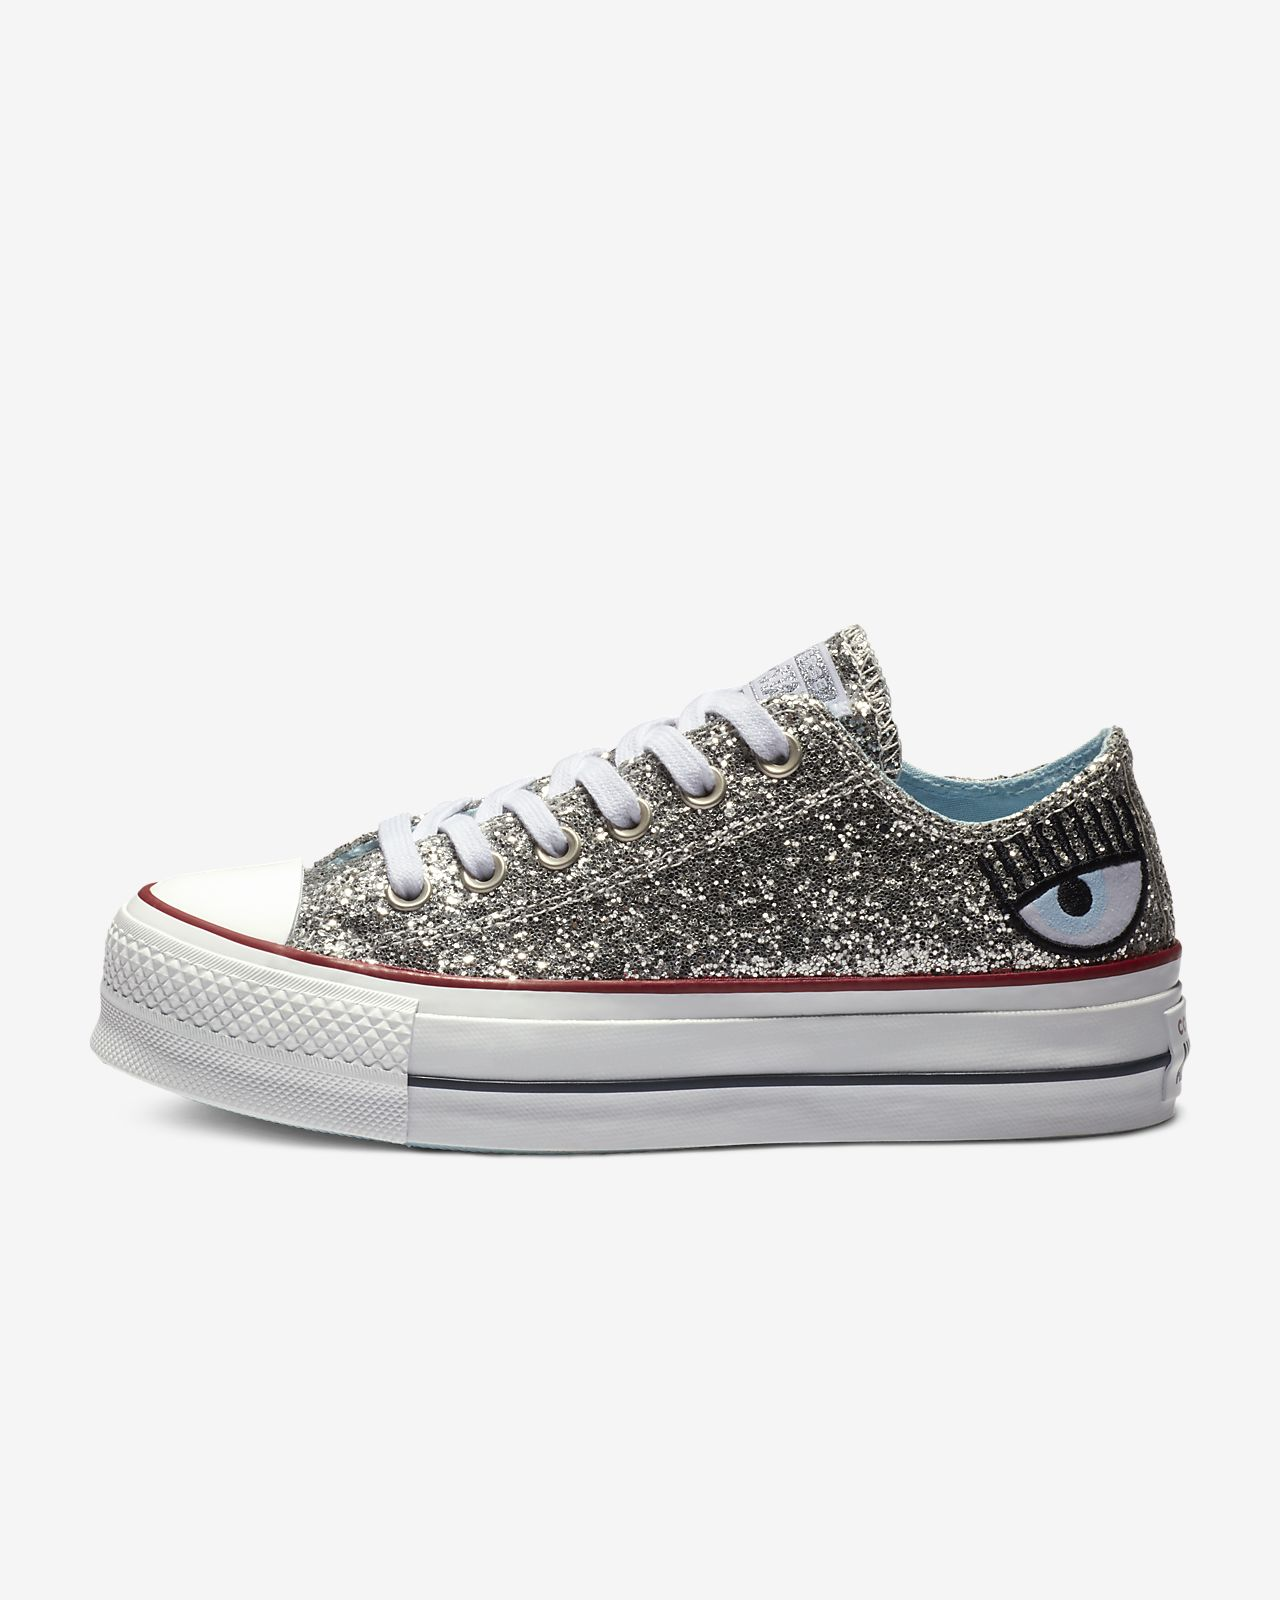 7c3090f4ec1c9 closeout converse x chiara chuck taylor all star lift low top womens shoe  20481 7048b